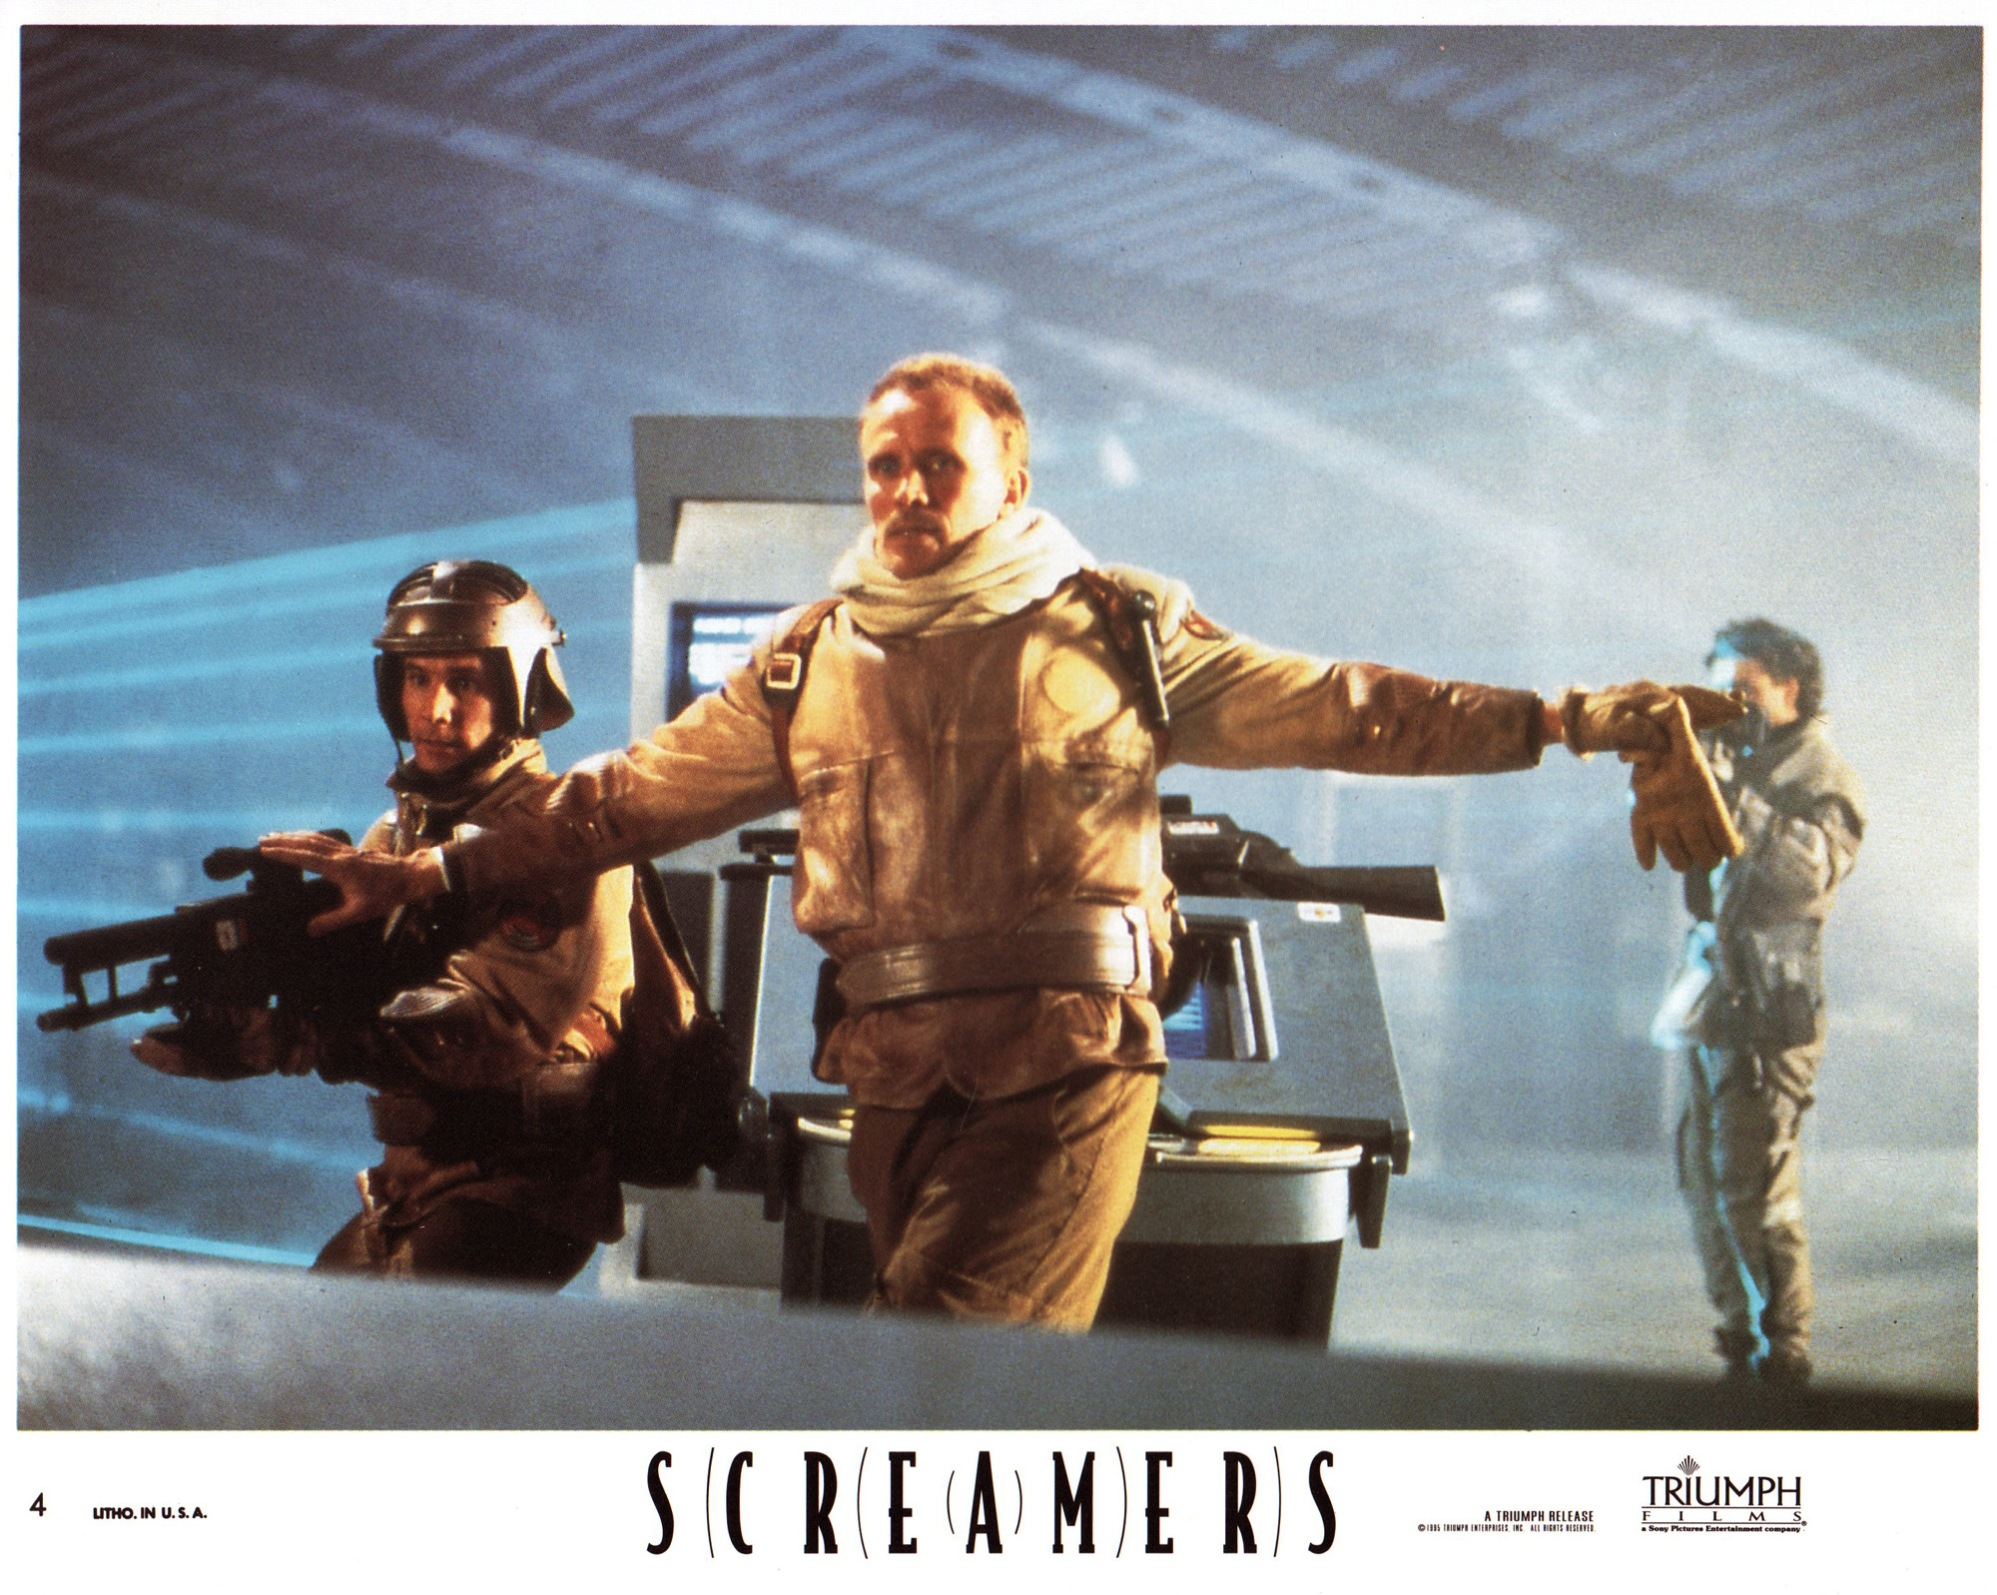 screamers-uk-4